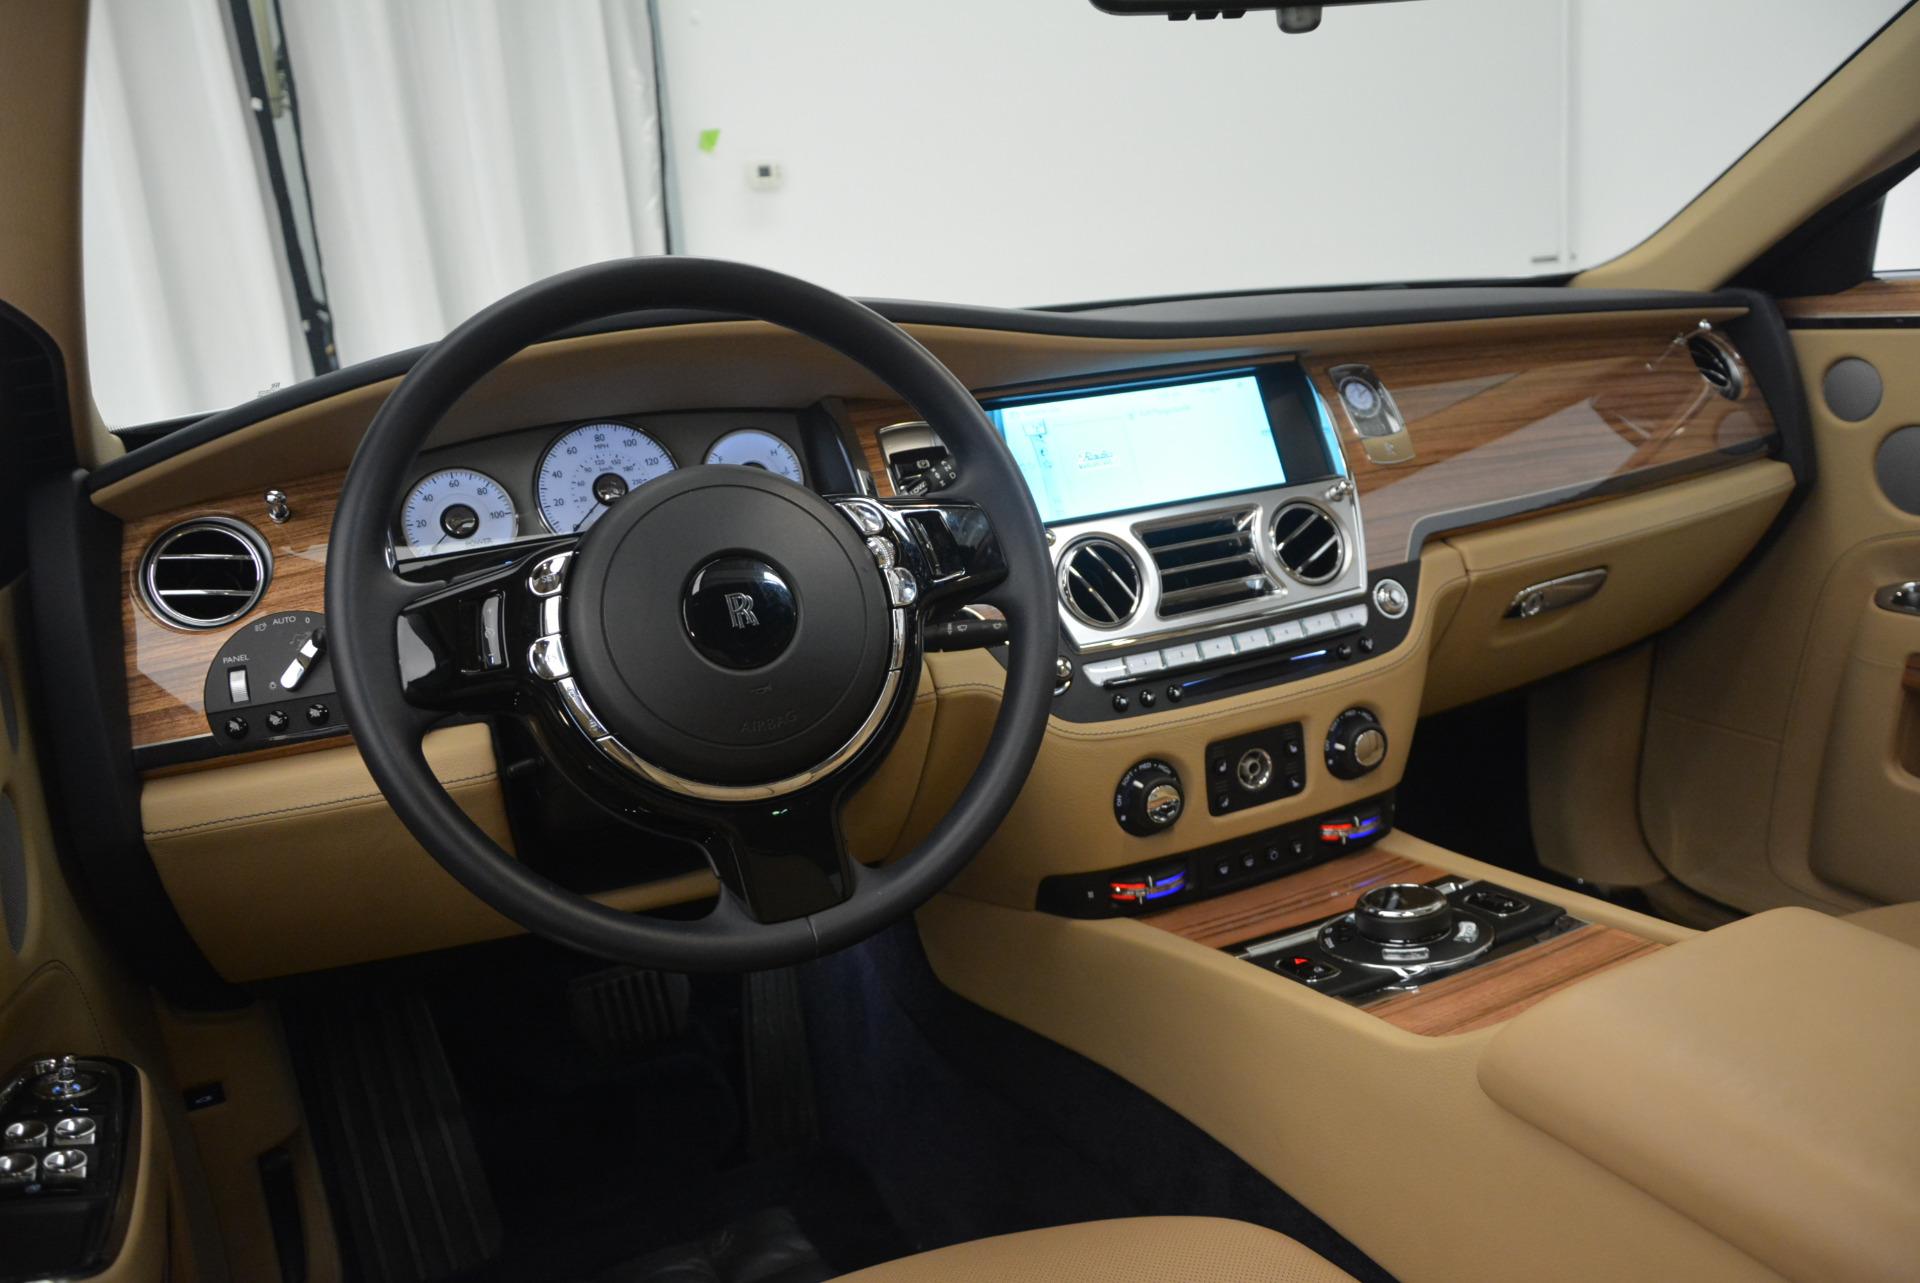 Used 2014 Rolls-Royce Ghost V-Spec For Sale In Westport, CT 858_p23